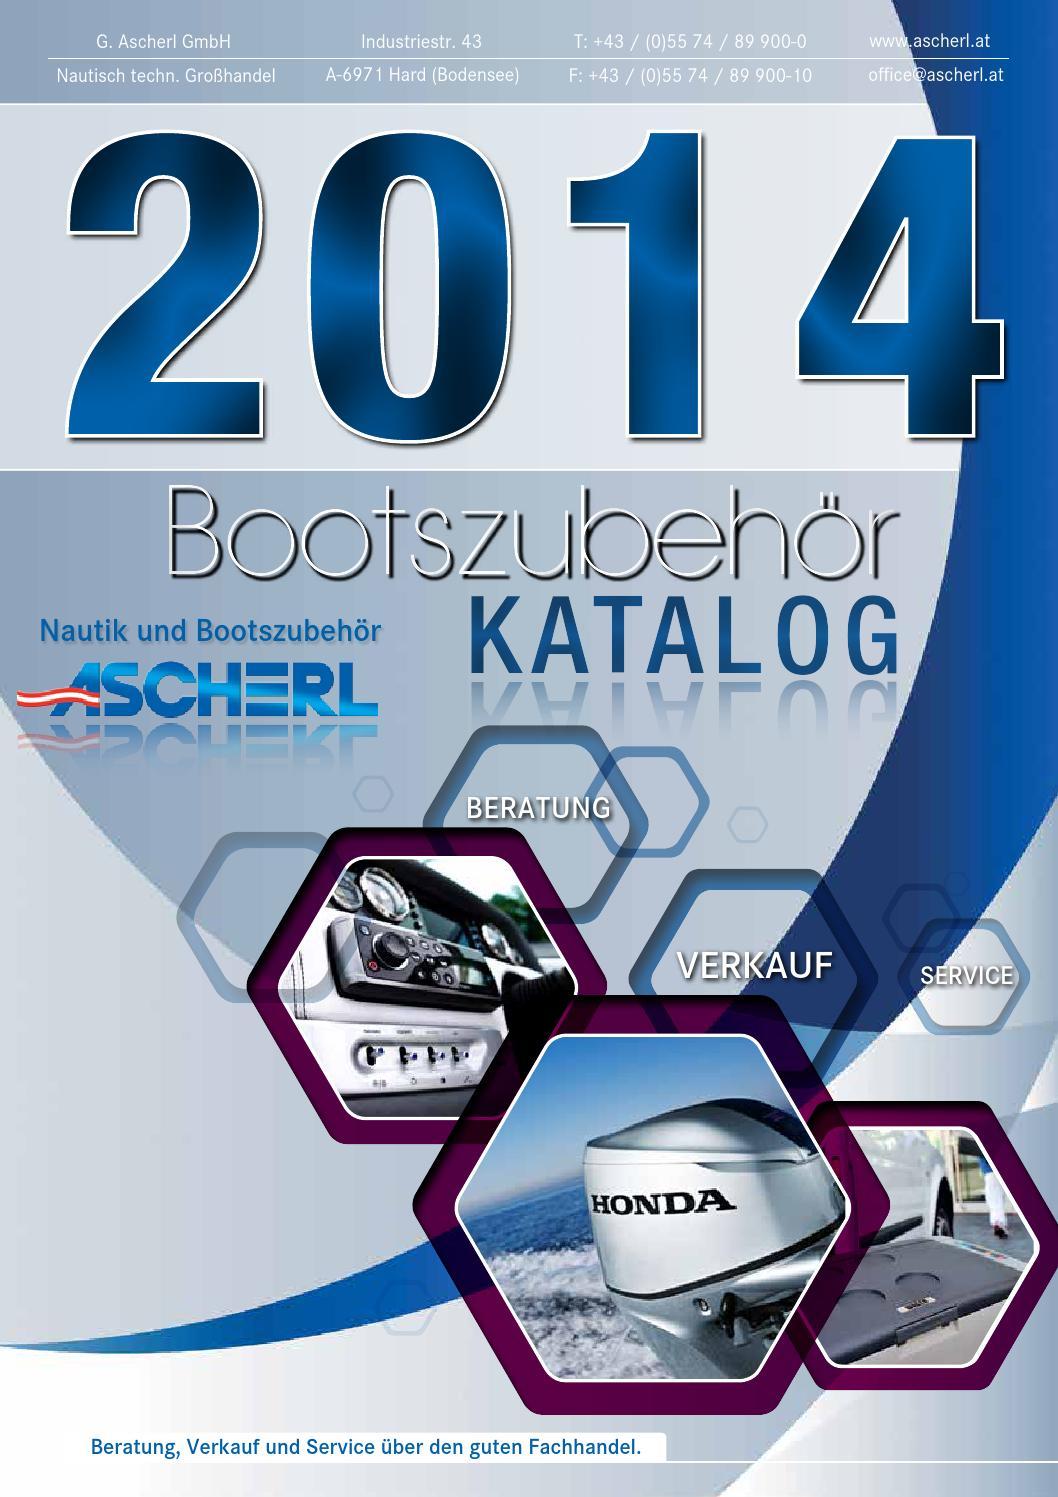 Katalog 2014 by Ascherl GmbH - issuu